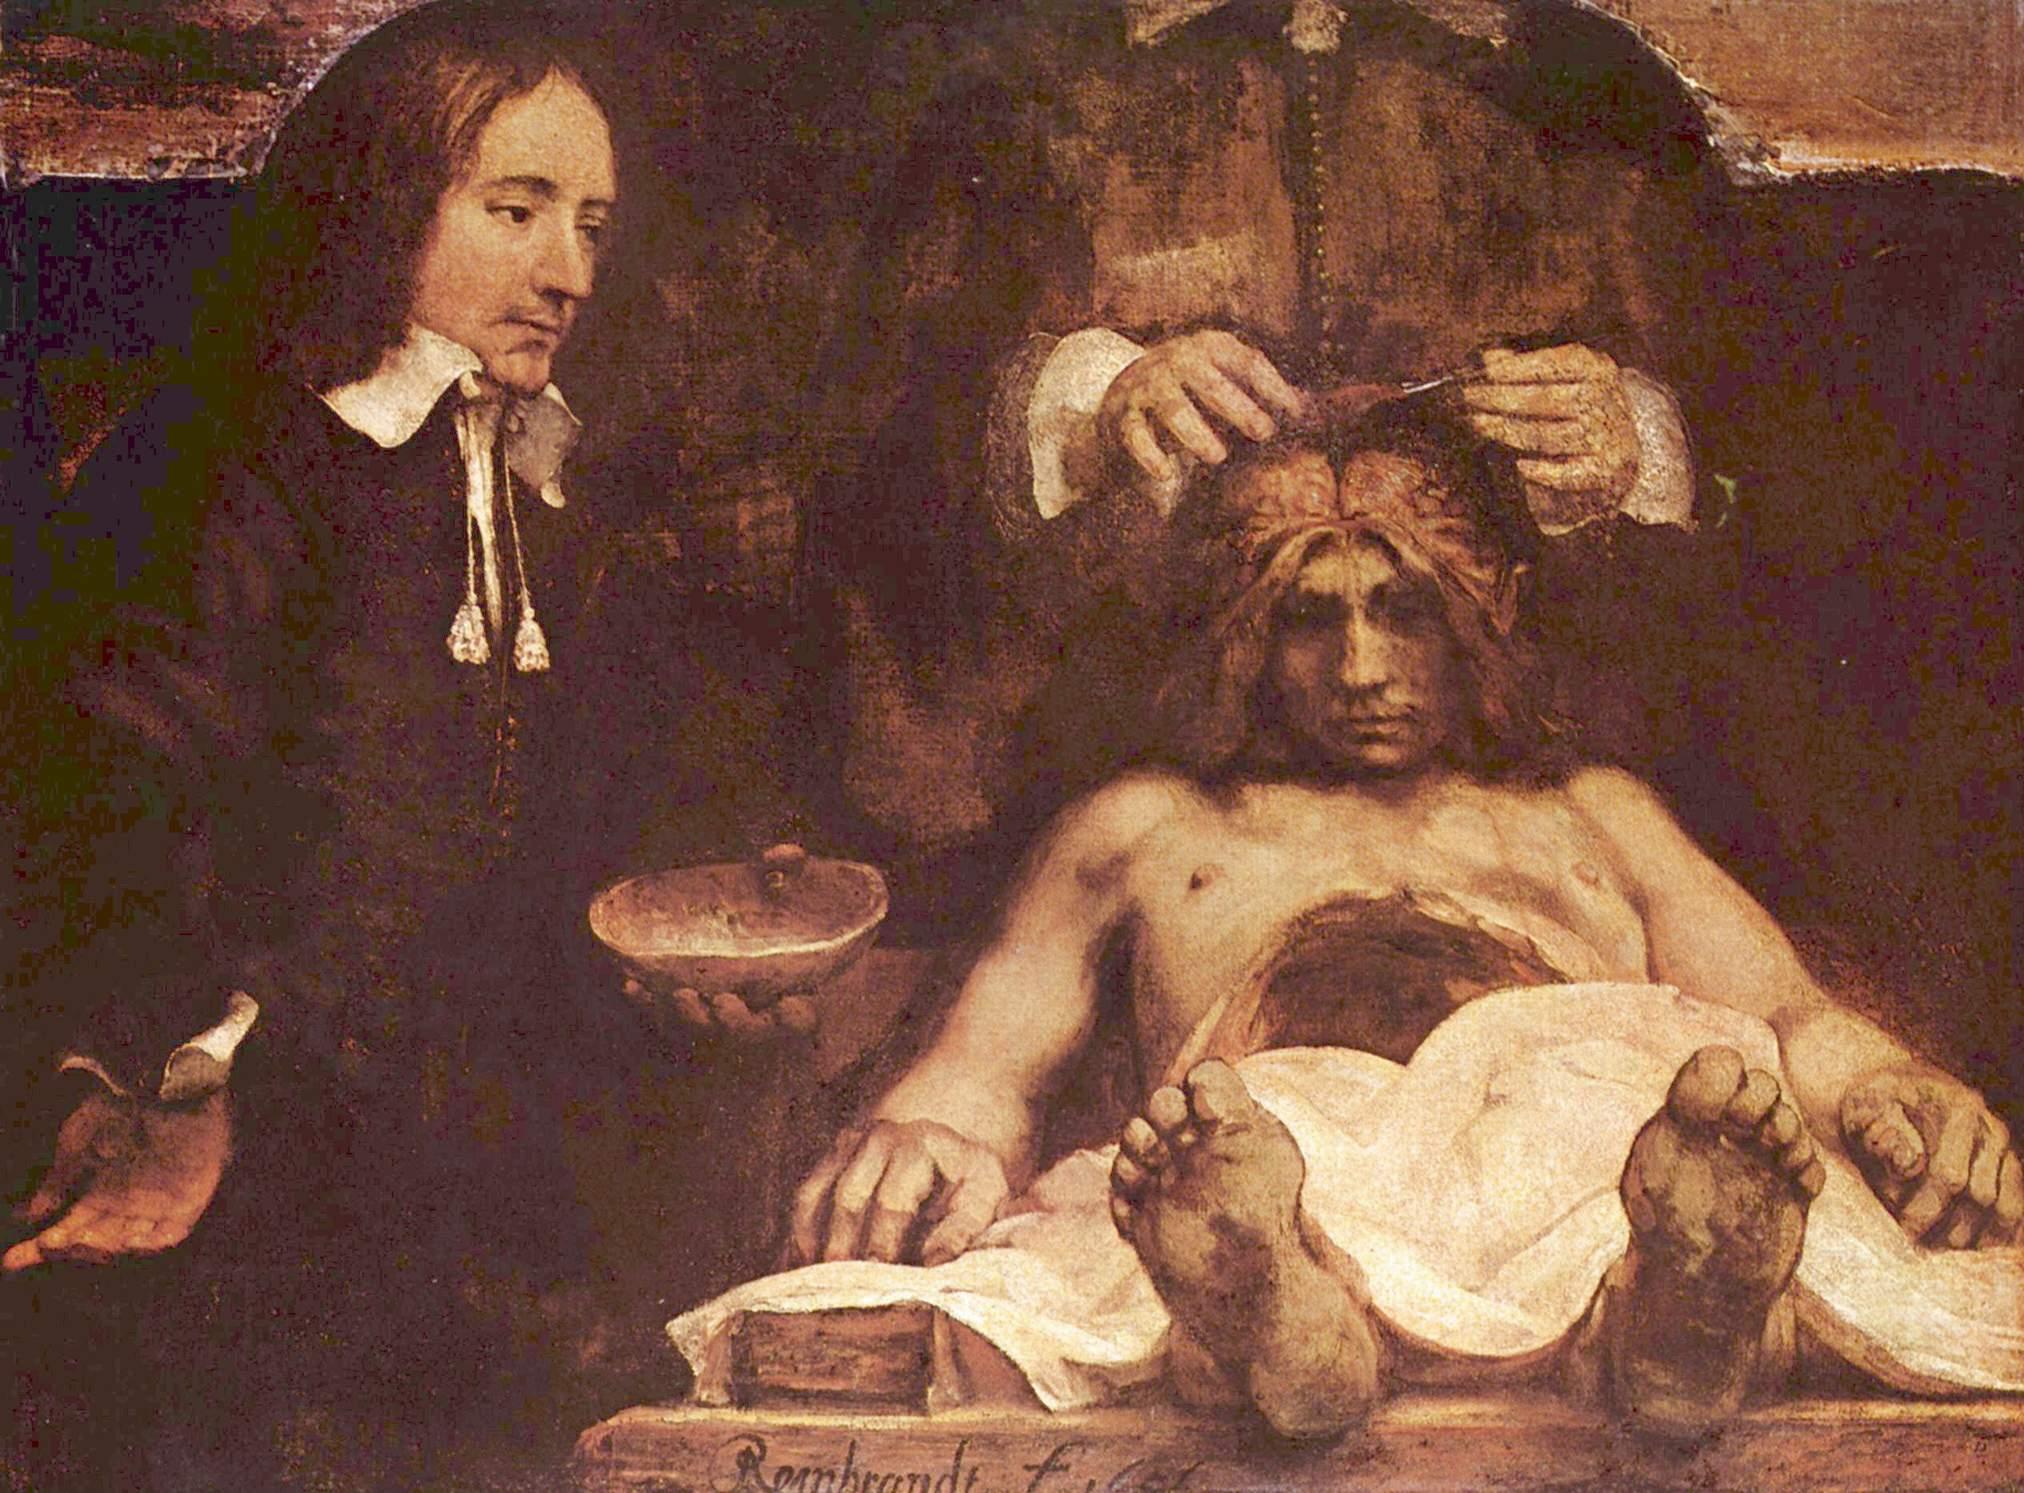 Рембрандт ван Рейн. Урок анатомии. 1656.